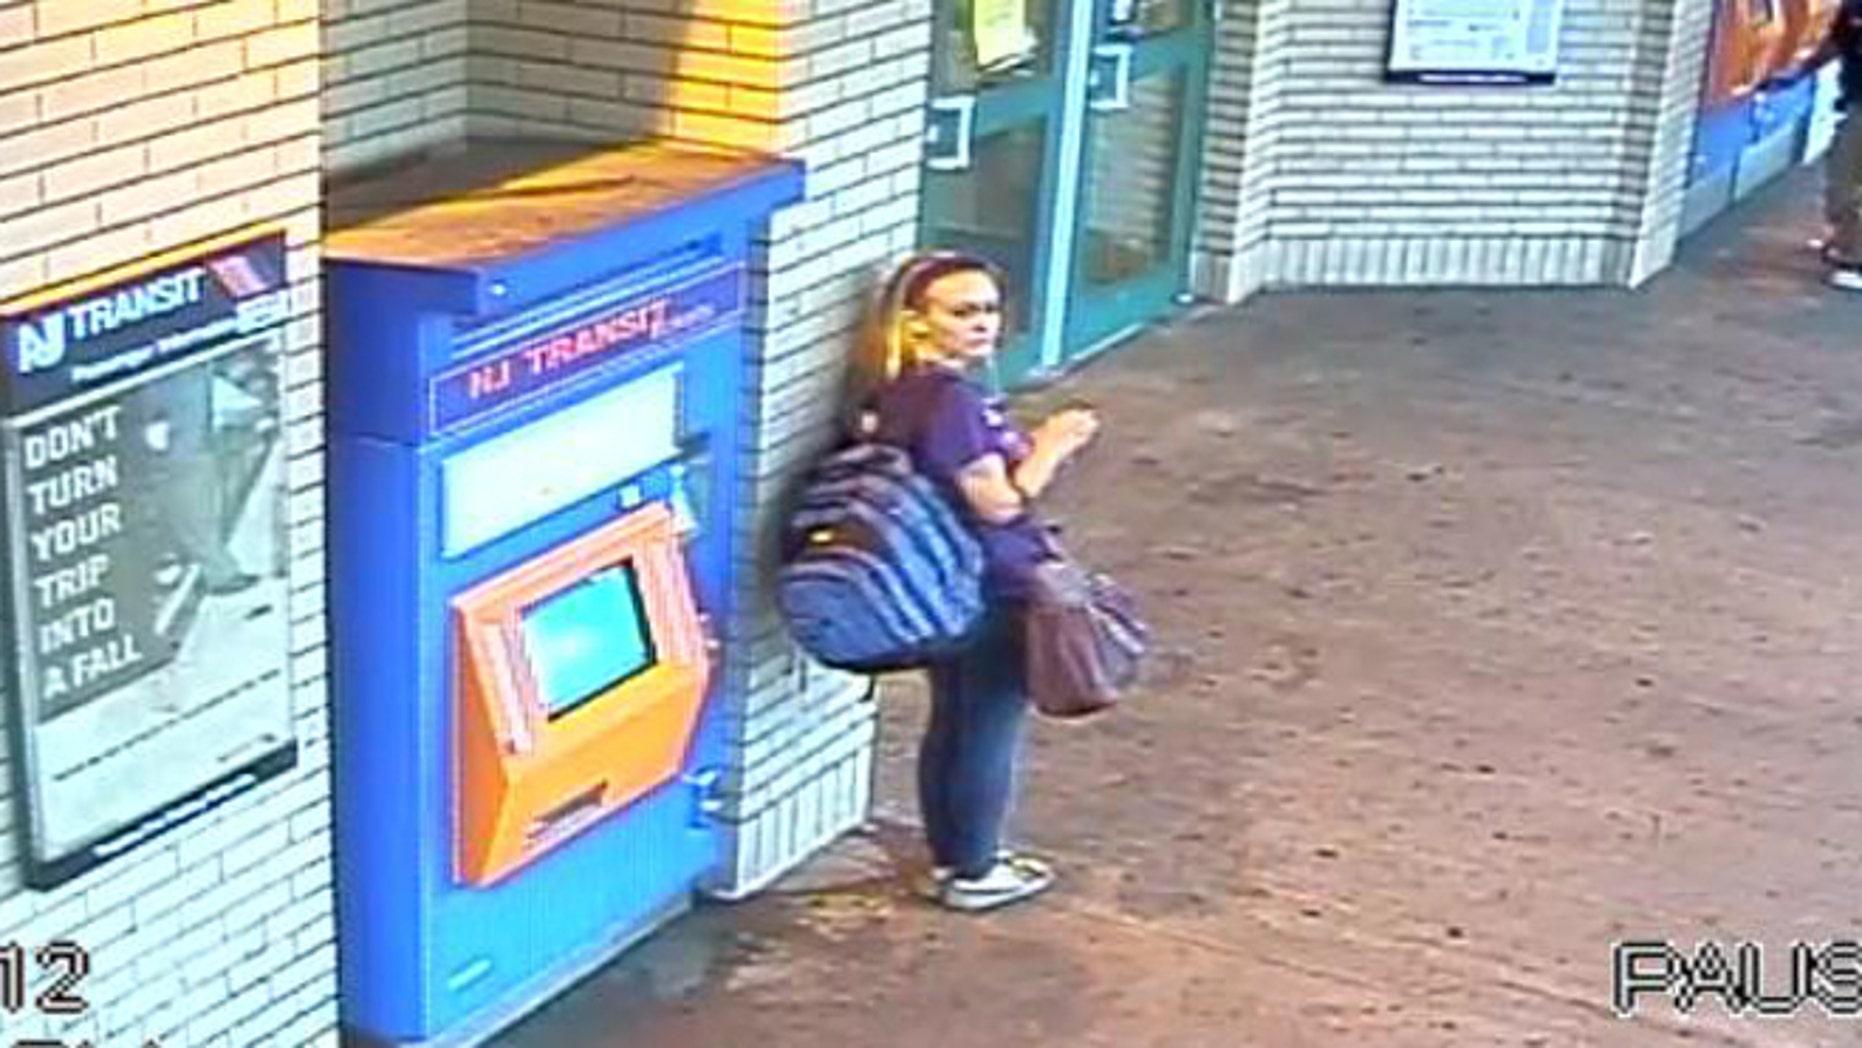 Sept. 30:  image from surveillance video shows Kara Alongi at the Rahway, N.J. train station.